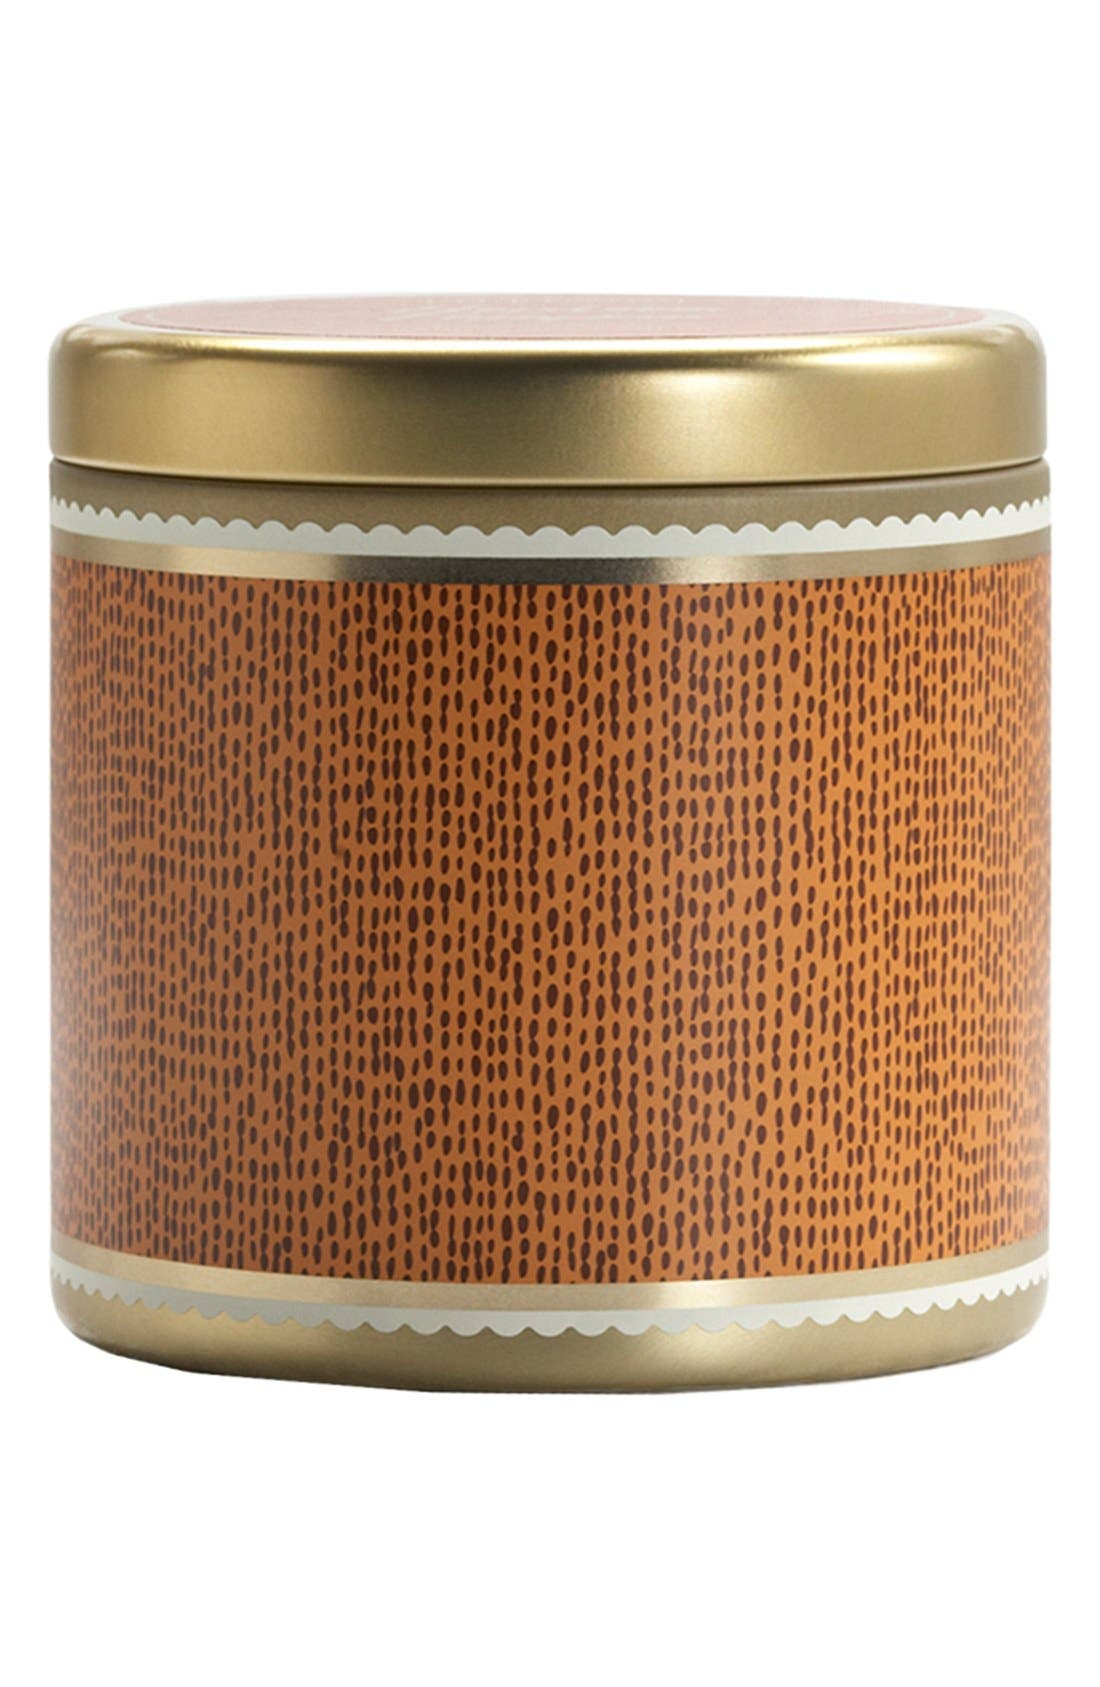 Main Image - ILLUME CANDLES Heirloom Pumpkin Tin - Large' Candle